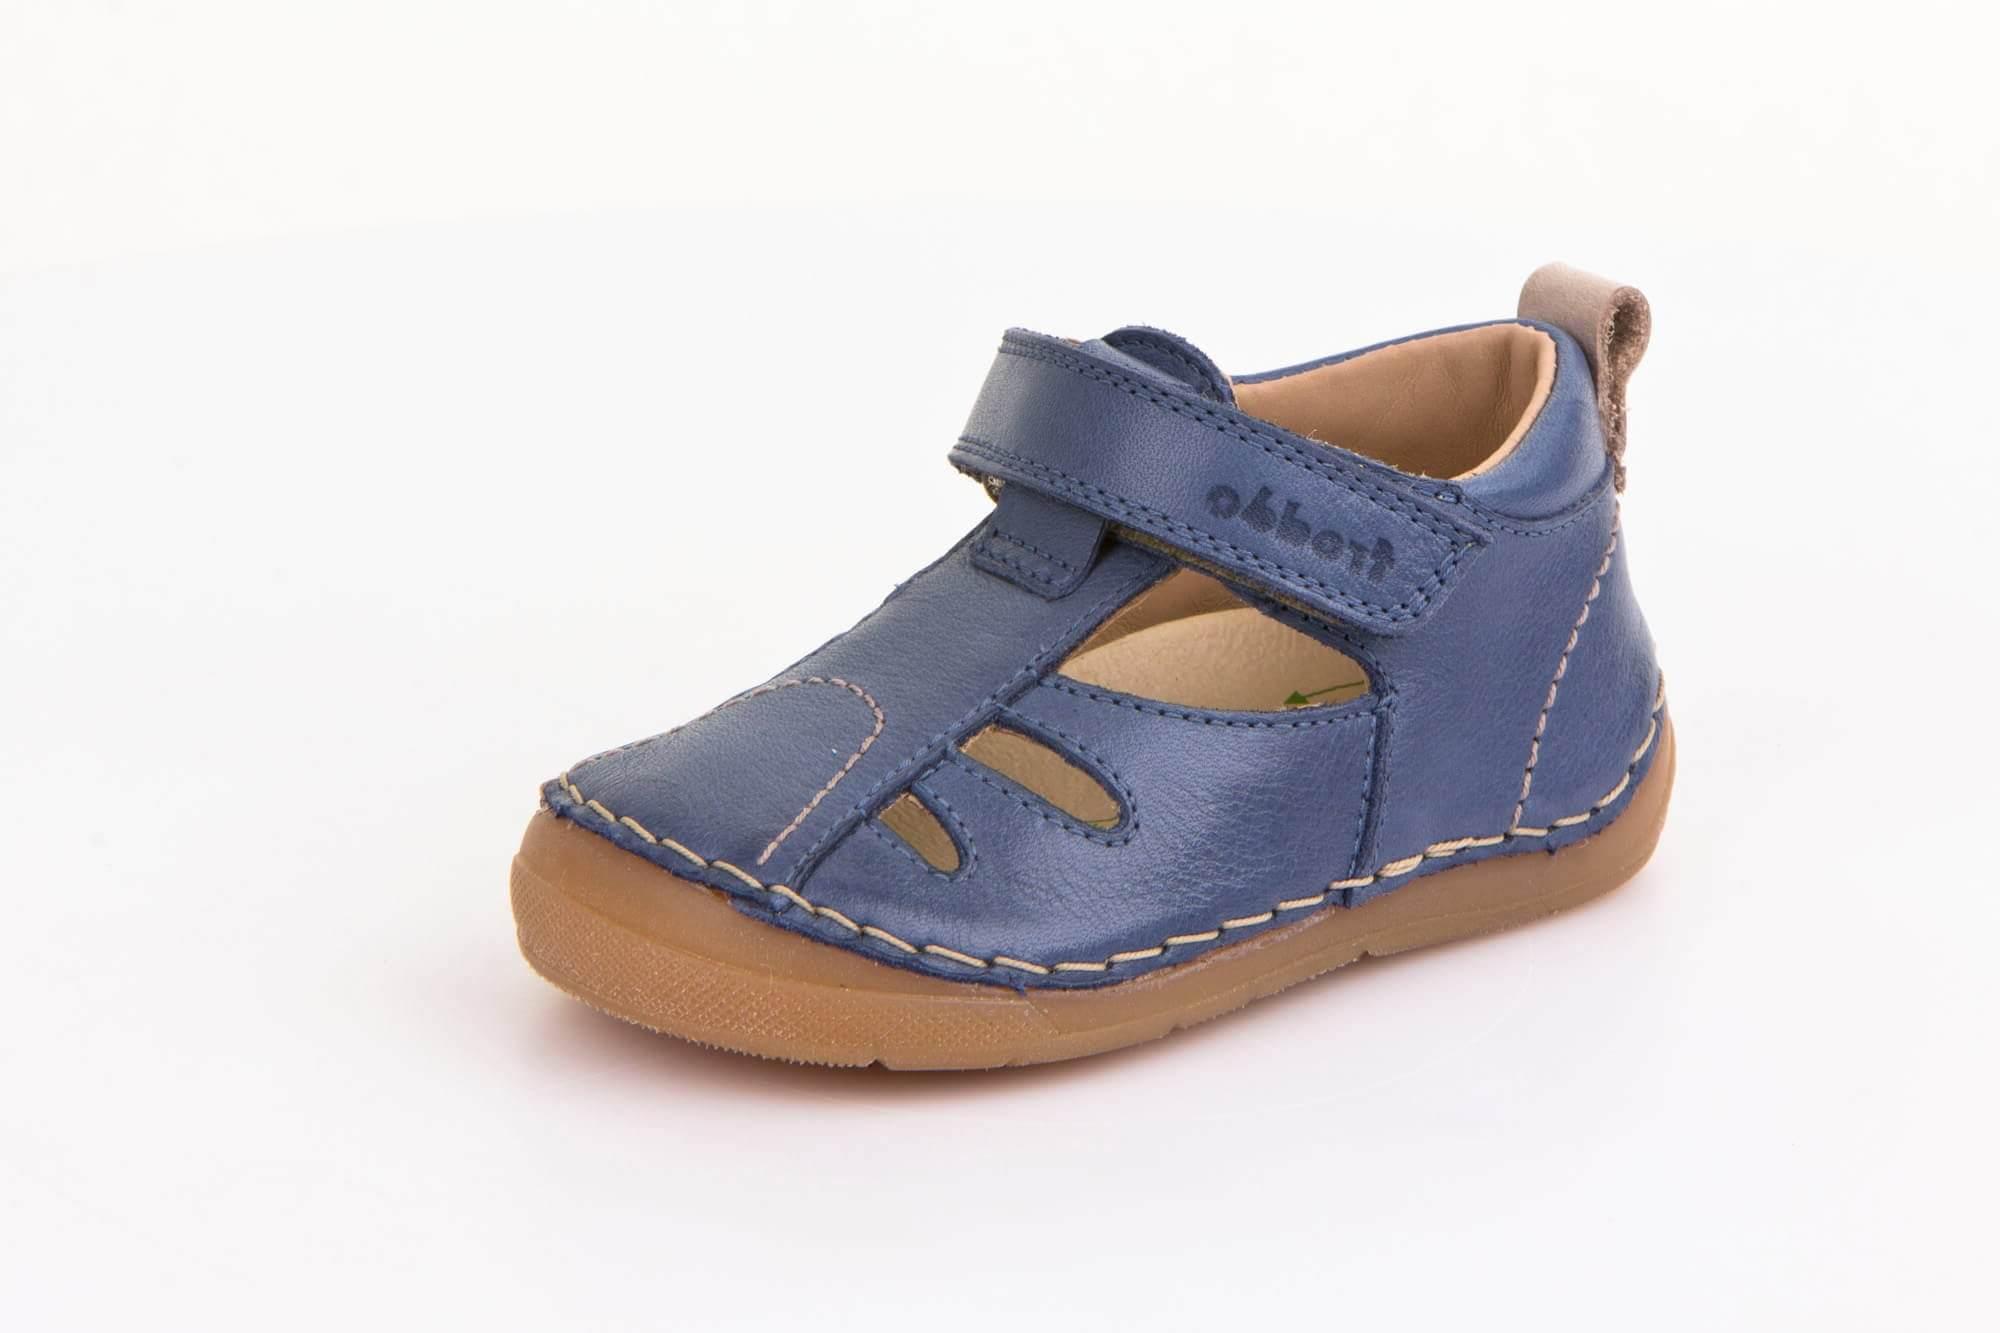 9a82562d85fb ... chlapca›Sandalky›Froddo Denim sandále. Zľava